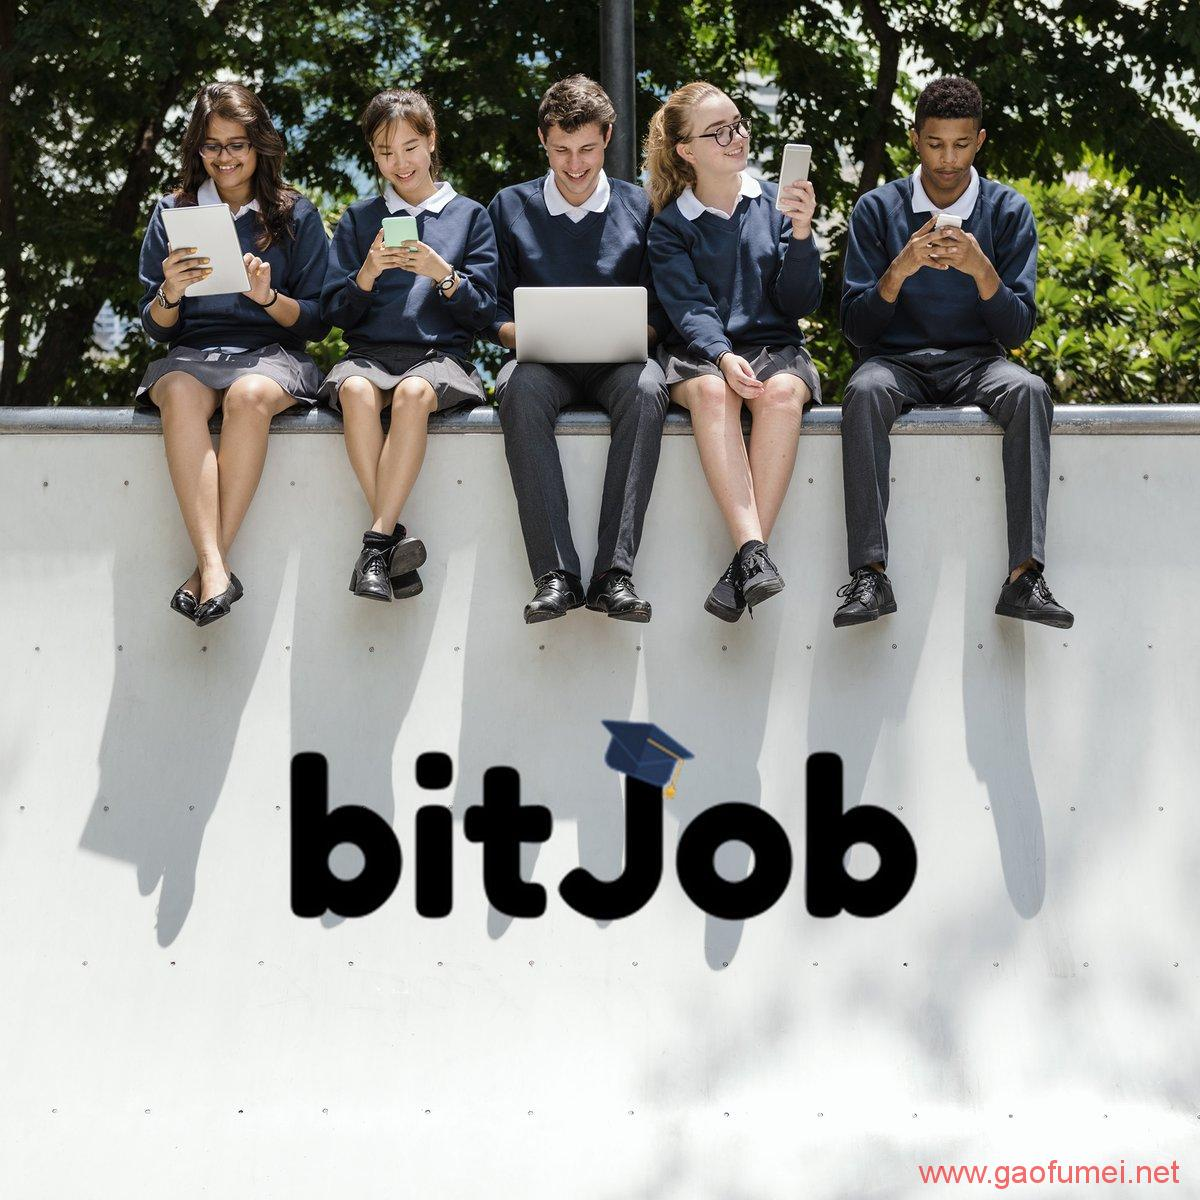 BitJob获得200万美元启动资金针对大学生的区块链就业服务平台